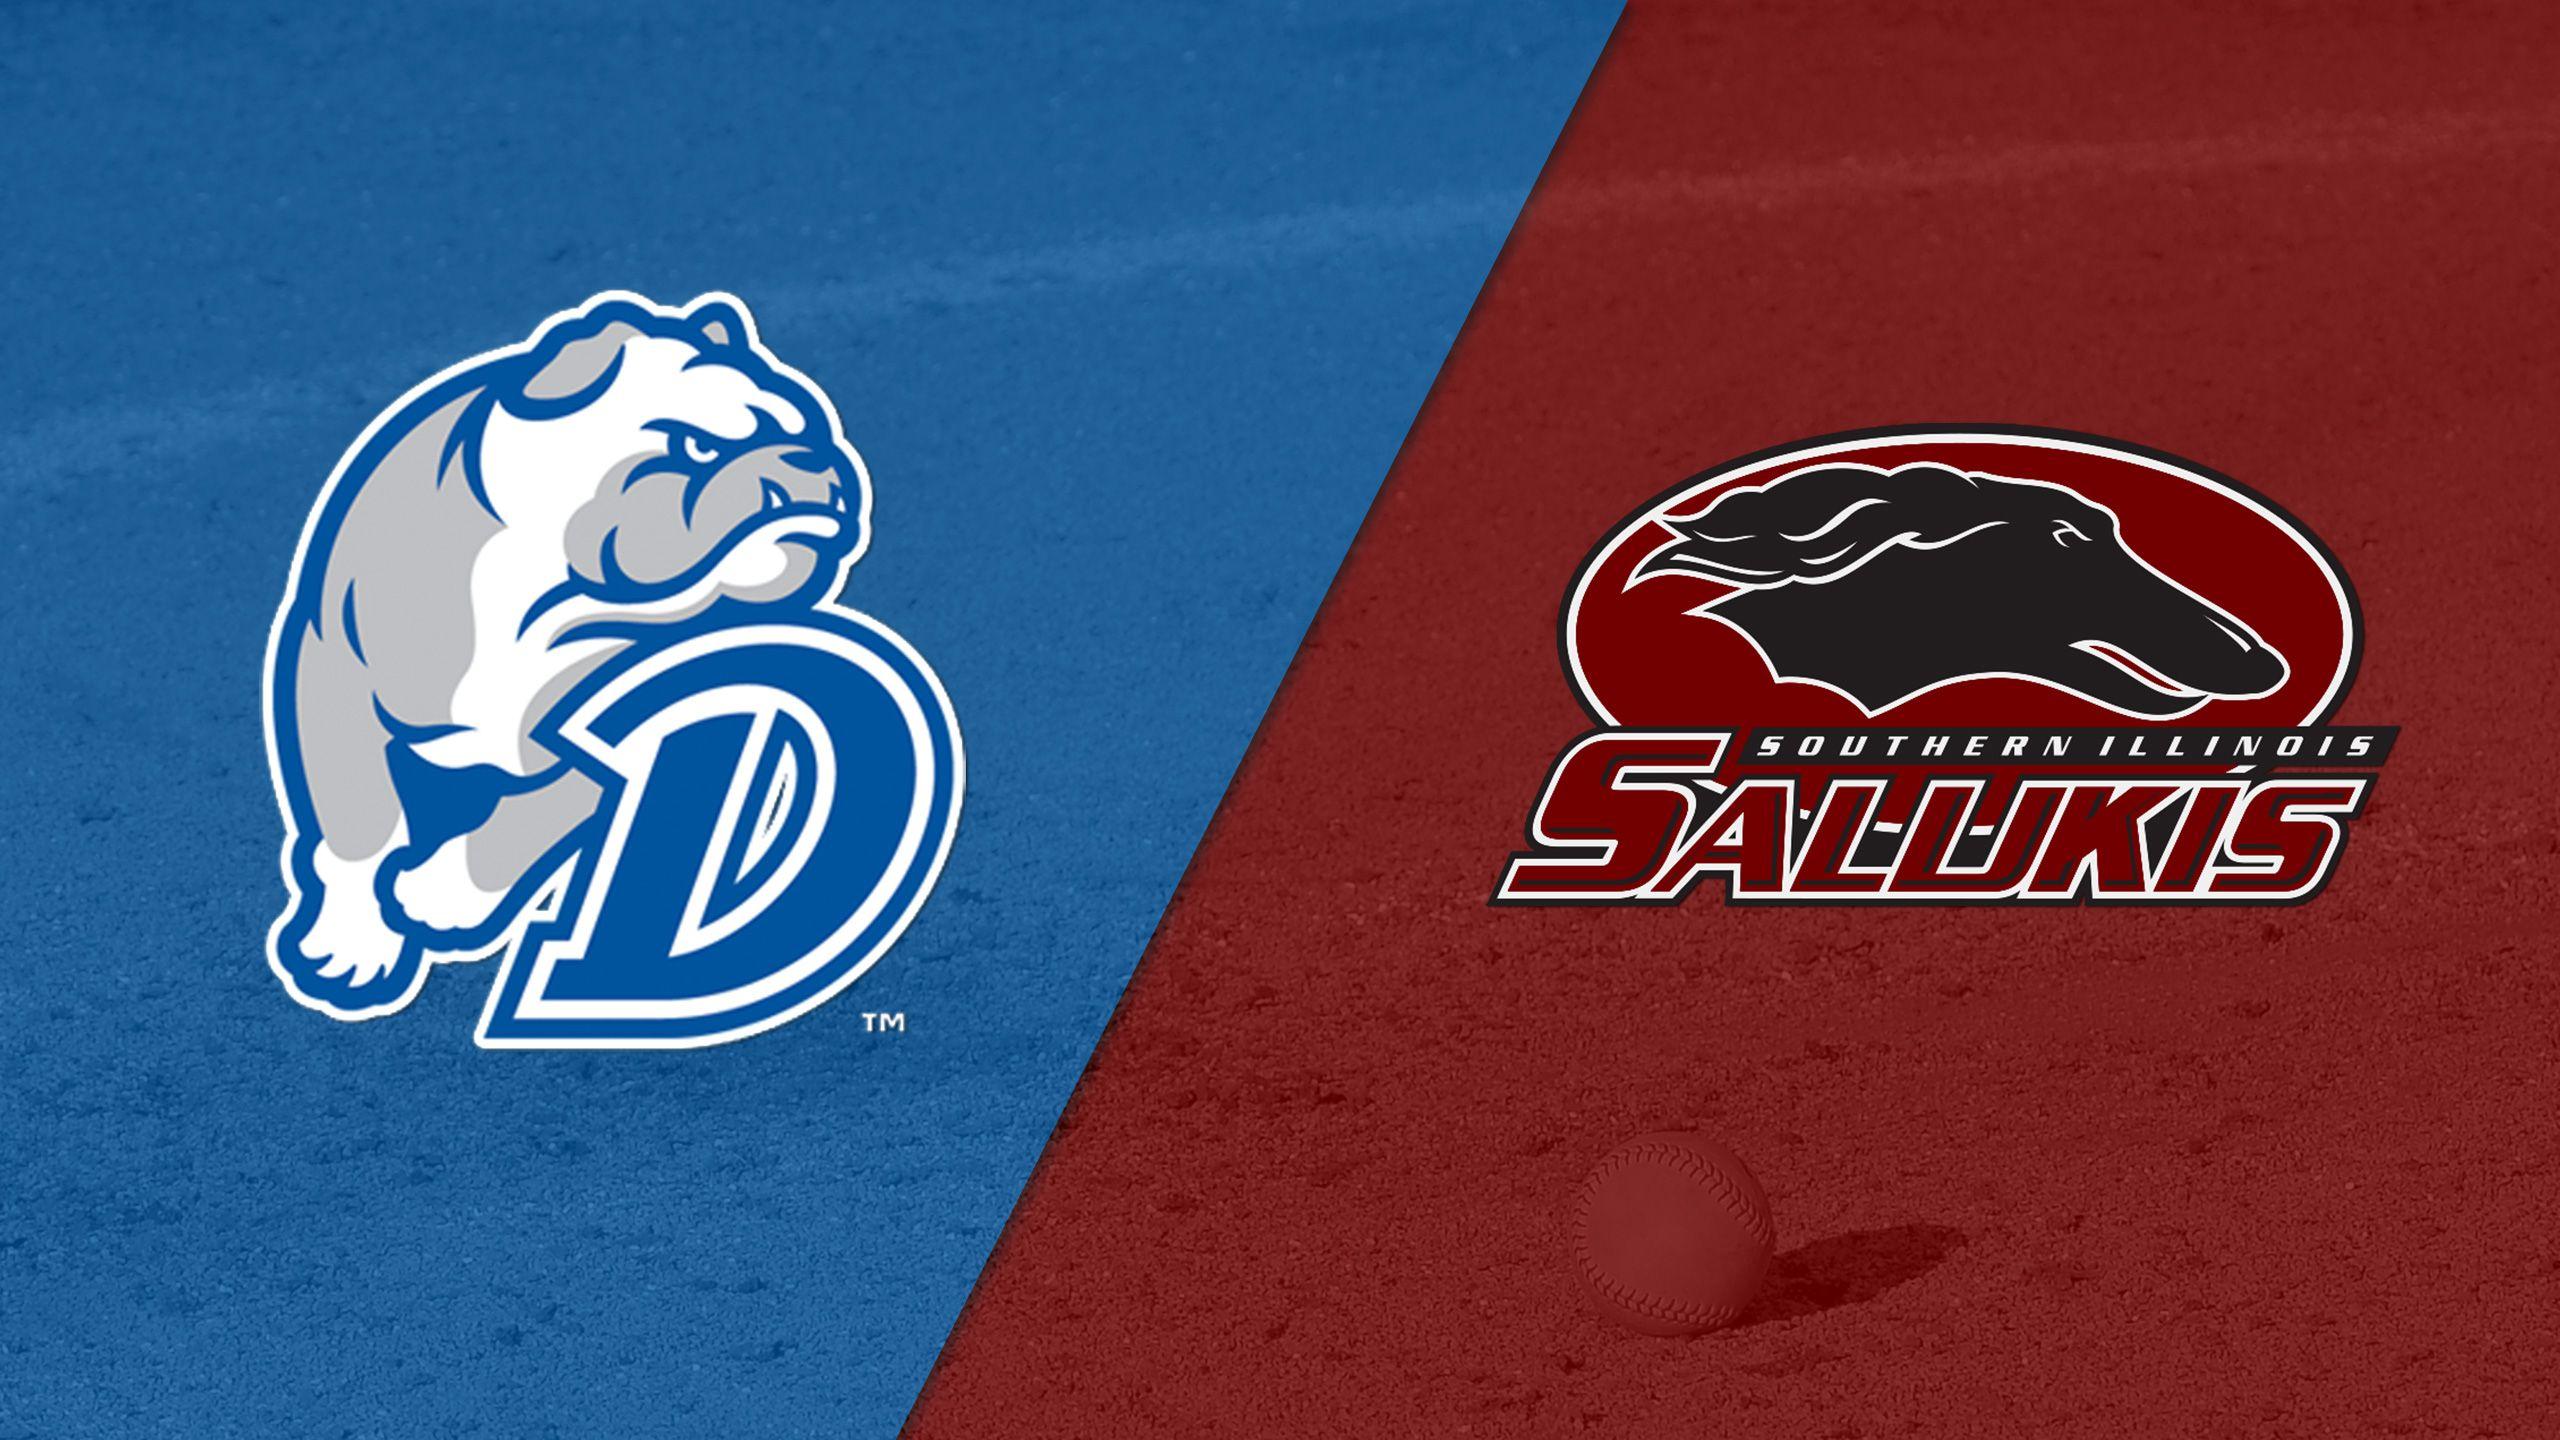 Drake vs. Southern Illinois (Softball)